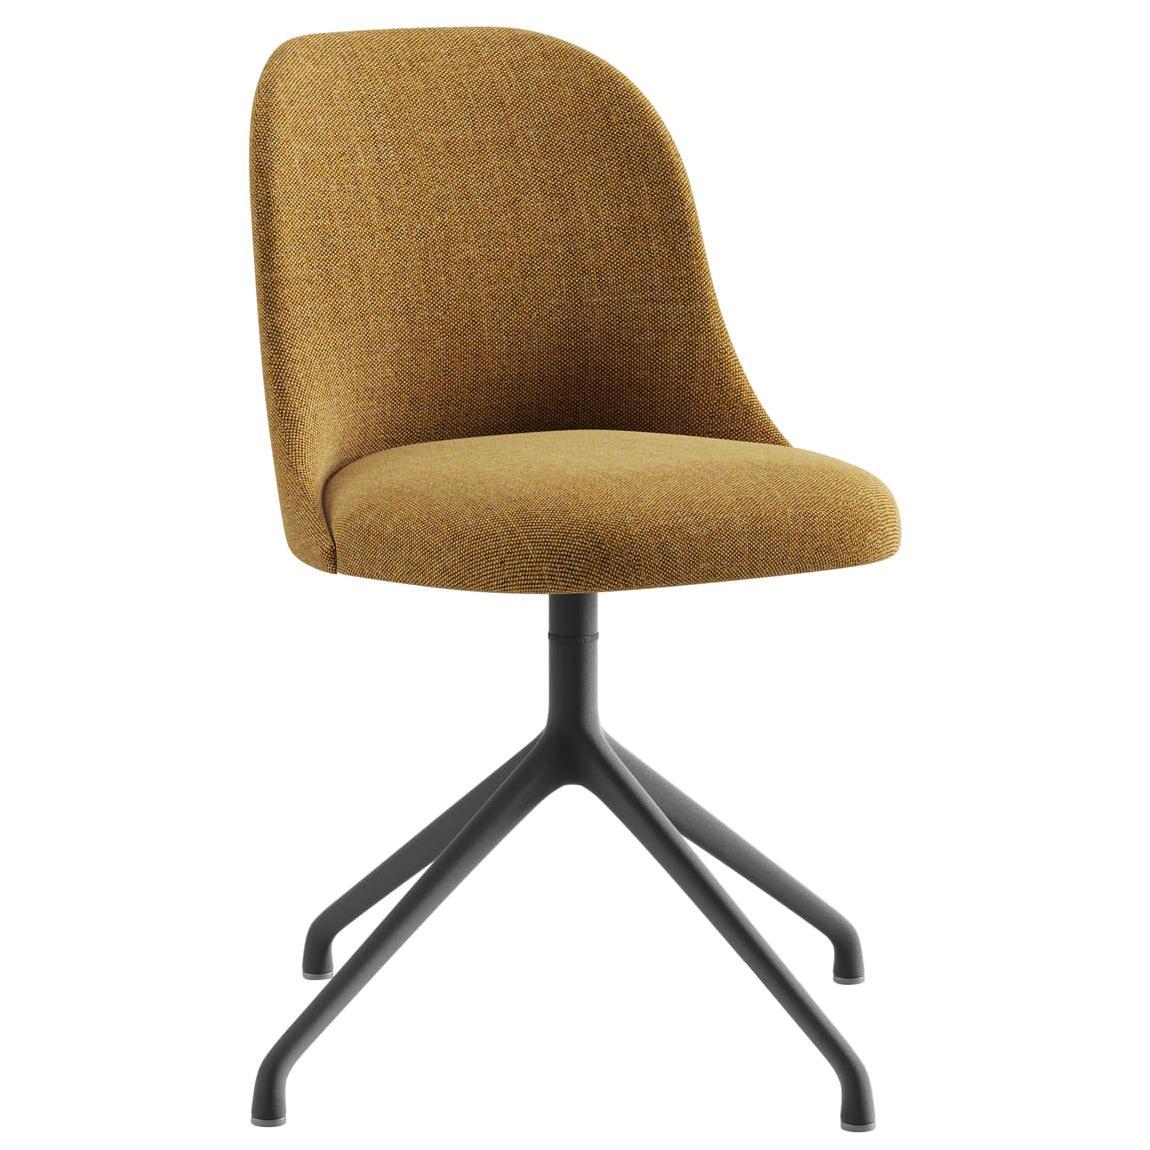 Viccarbe Aleta Chair Pyramid Base in Kvadarat Remix 433 Fabric